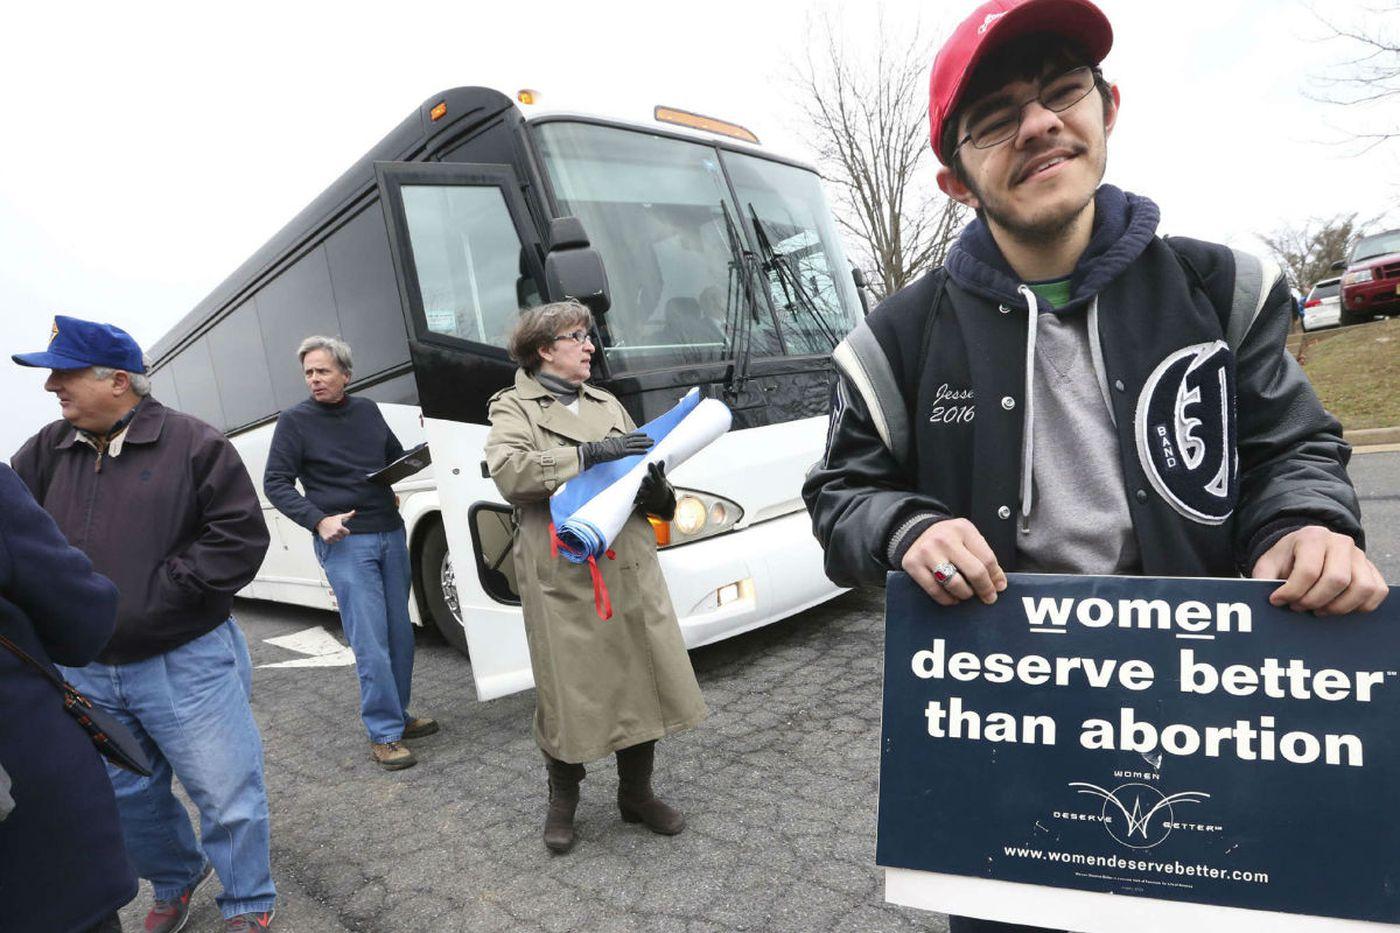 Jackson: Unite 'pro-life,' 'pro-choice' movements under 'pro-family' banner